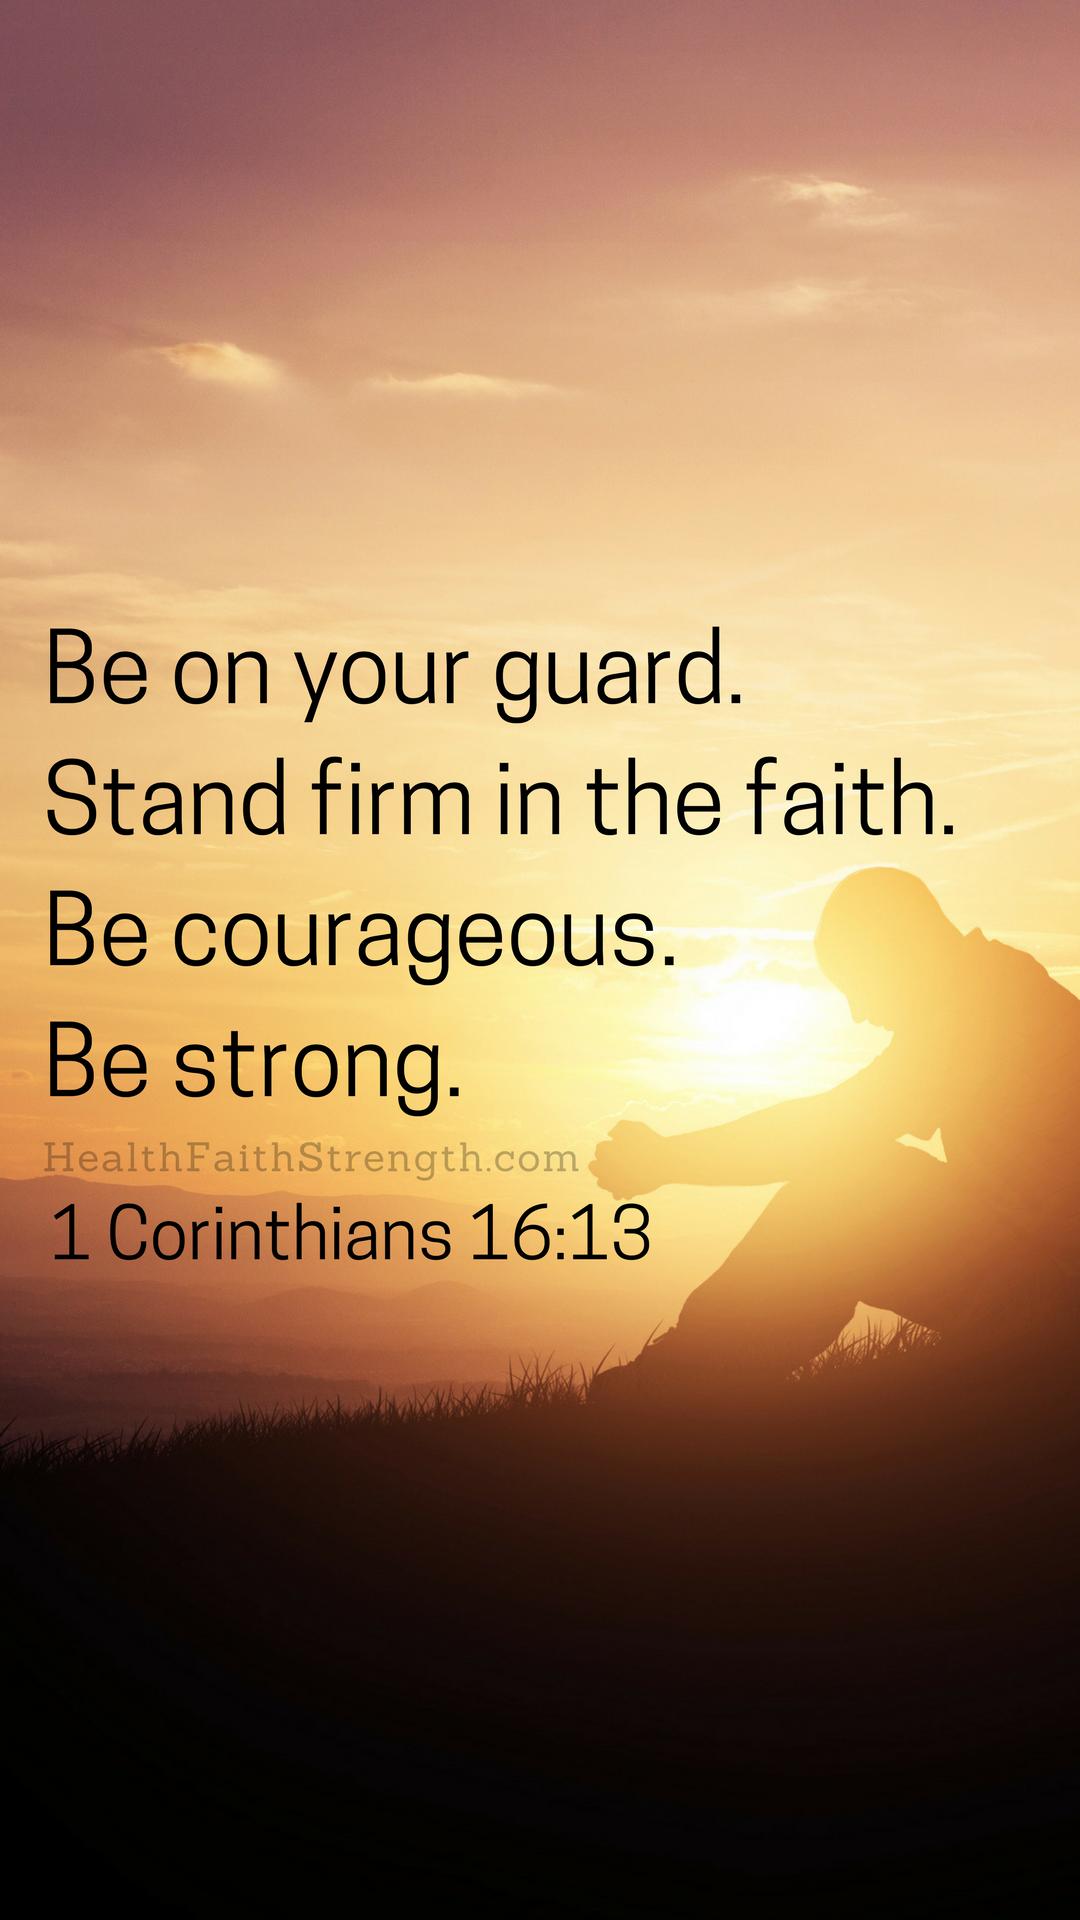 DOWNLOADABLE BIBLE VERSE WALLPAPERS FOR IPHONE - HealthFaithStrength.com - 1 Corinthians 16:13 ...